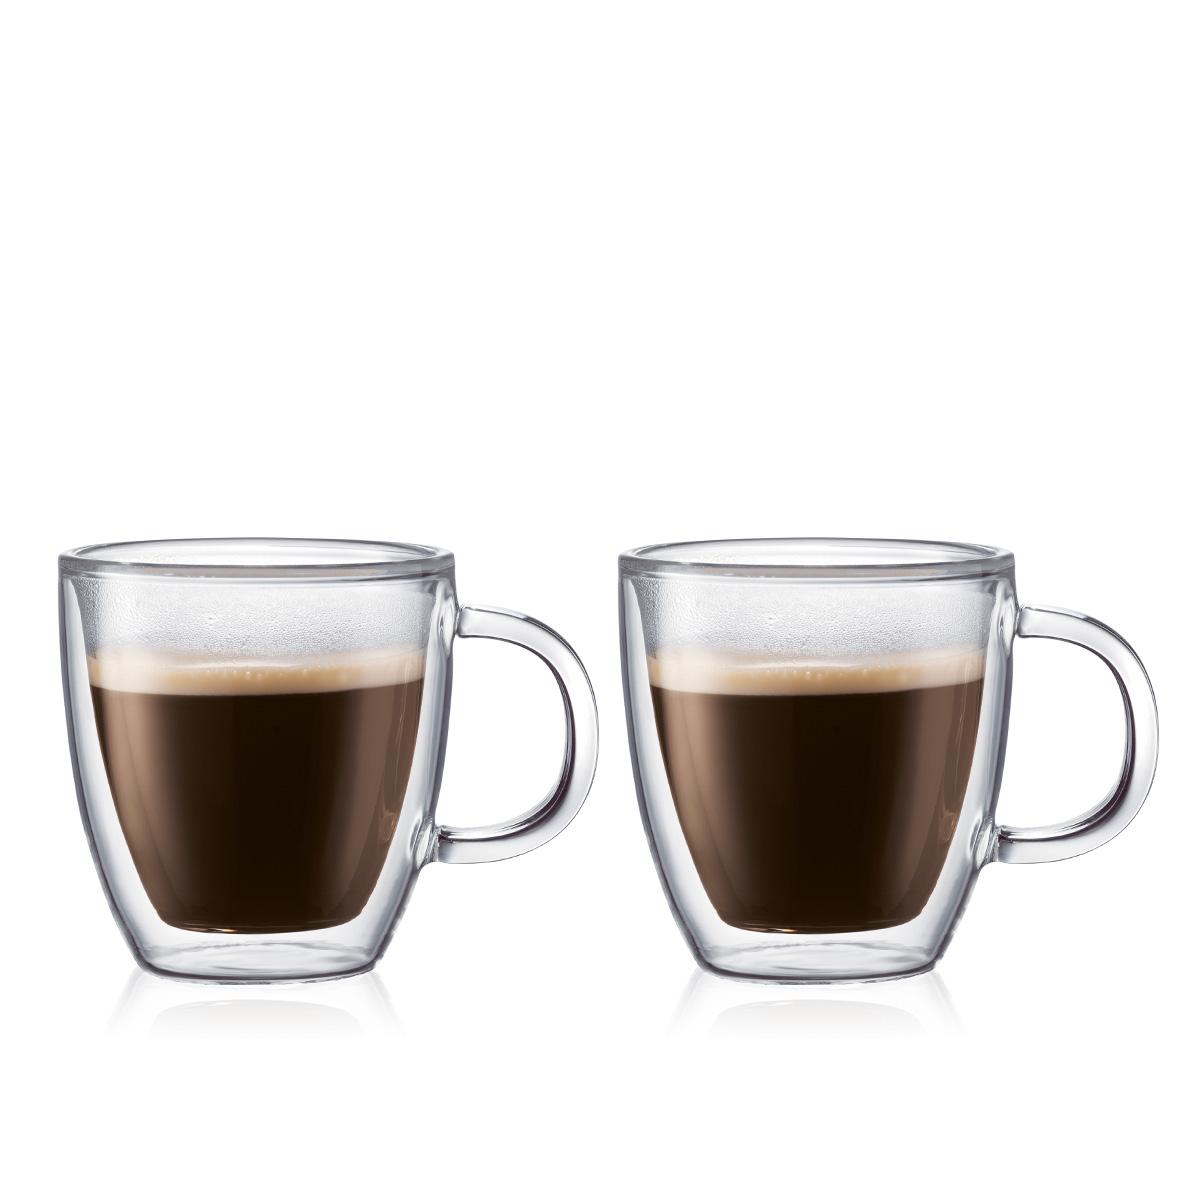 BISTRO: 2 chávenas térmicas, parede dupla, 0.15 l